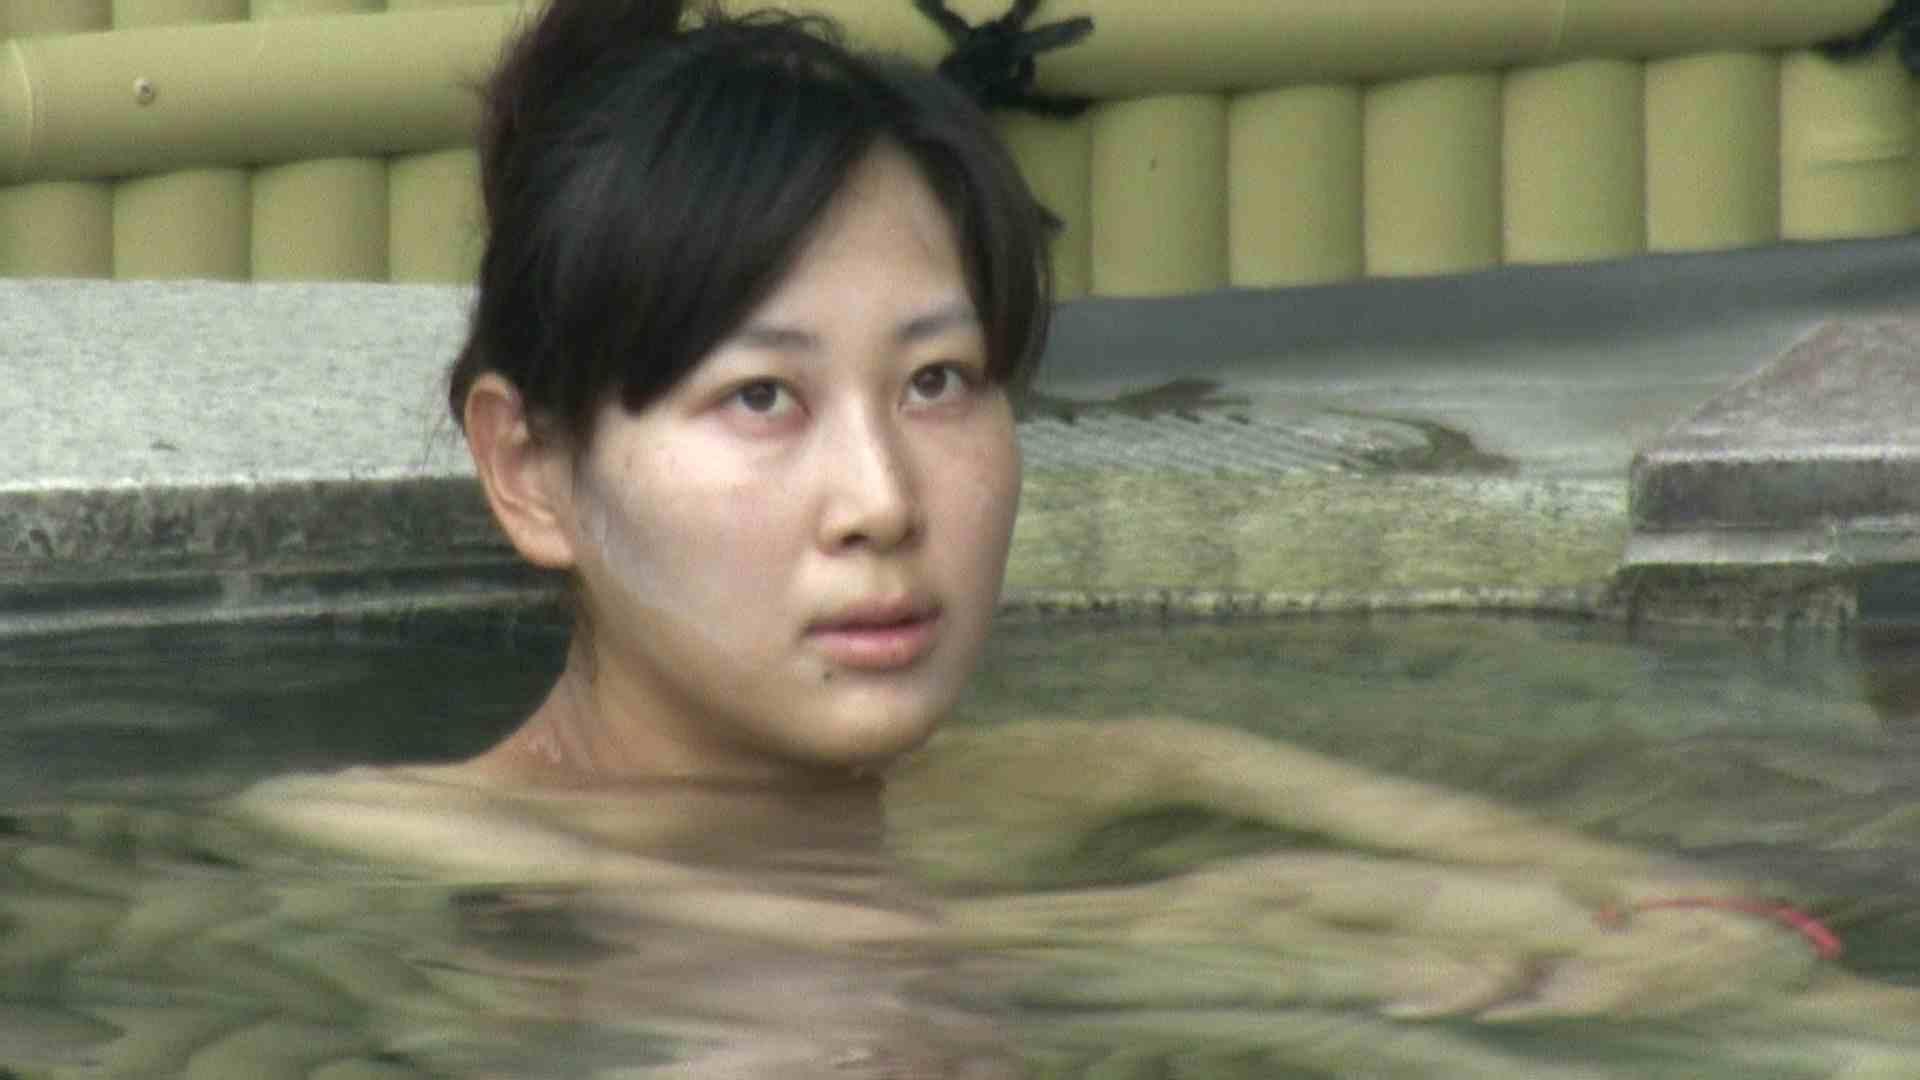 Aquaな露天風呂Vol.665 綺麗なOLたち  85枚 42